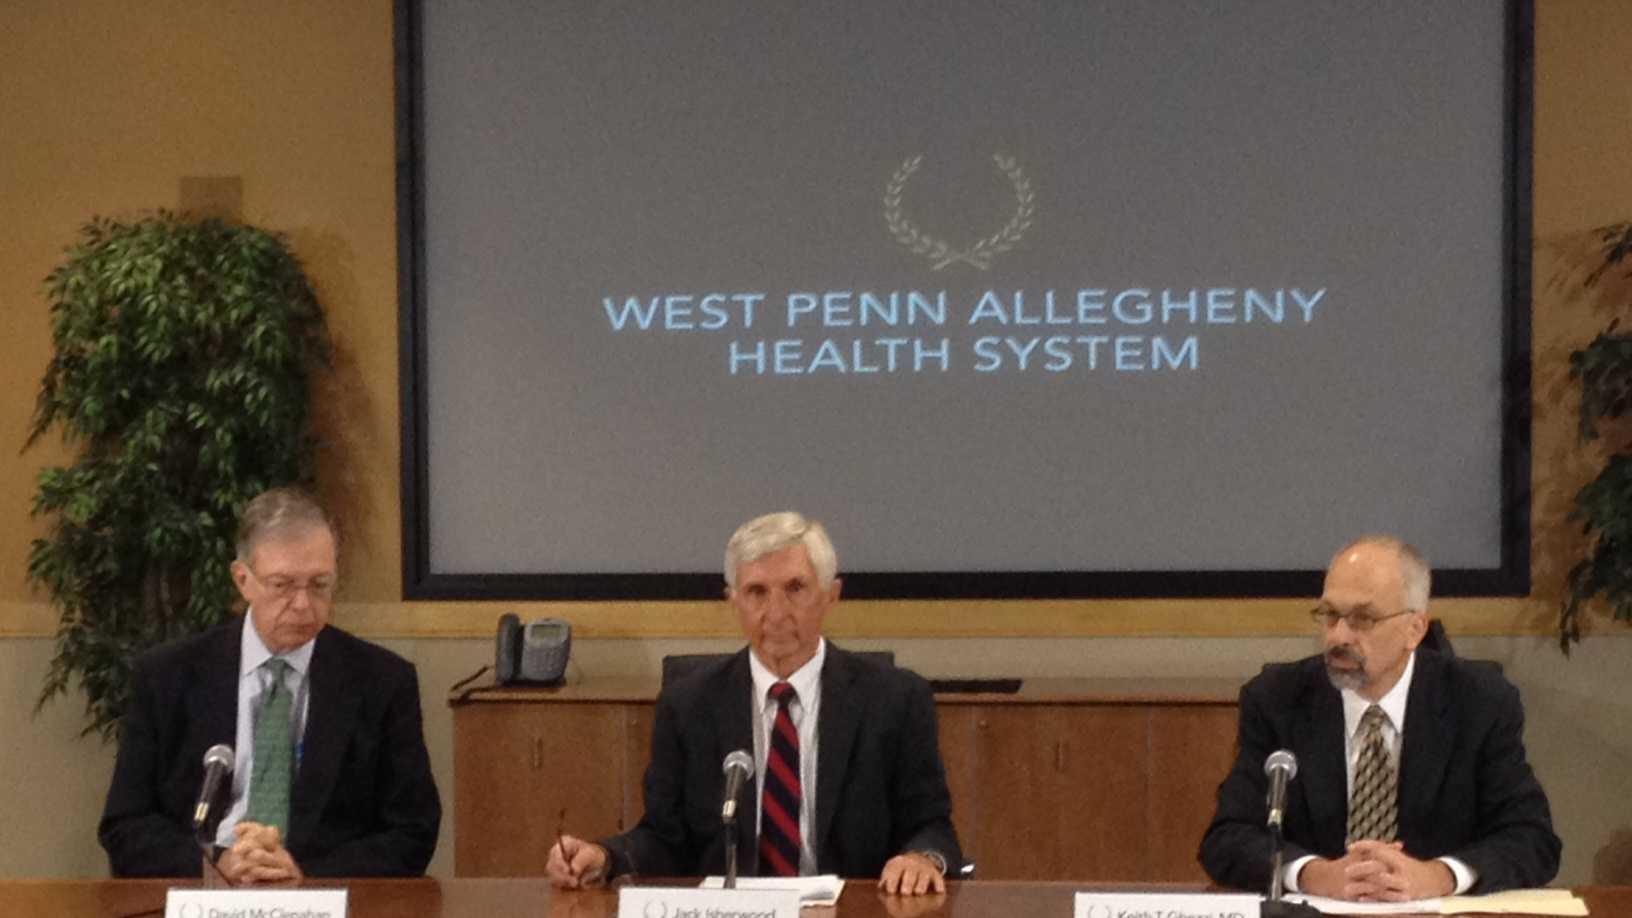 West Penn Allegheny newser